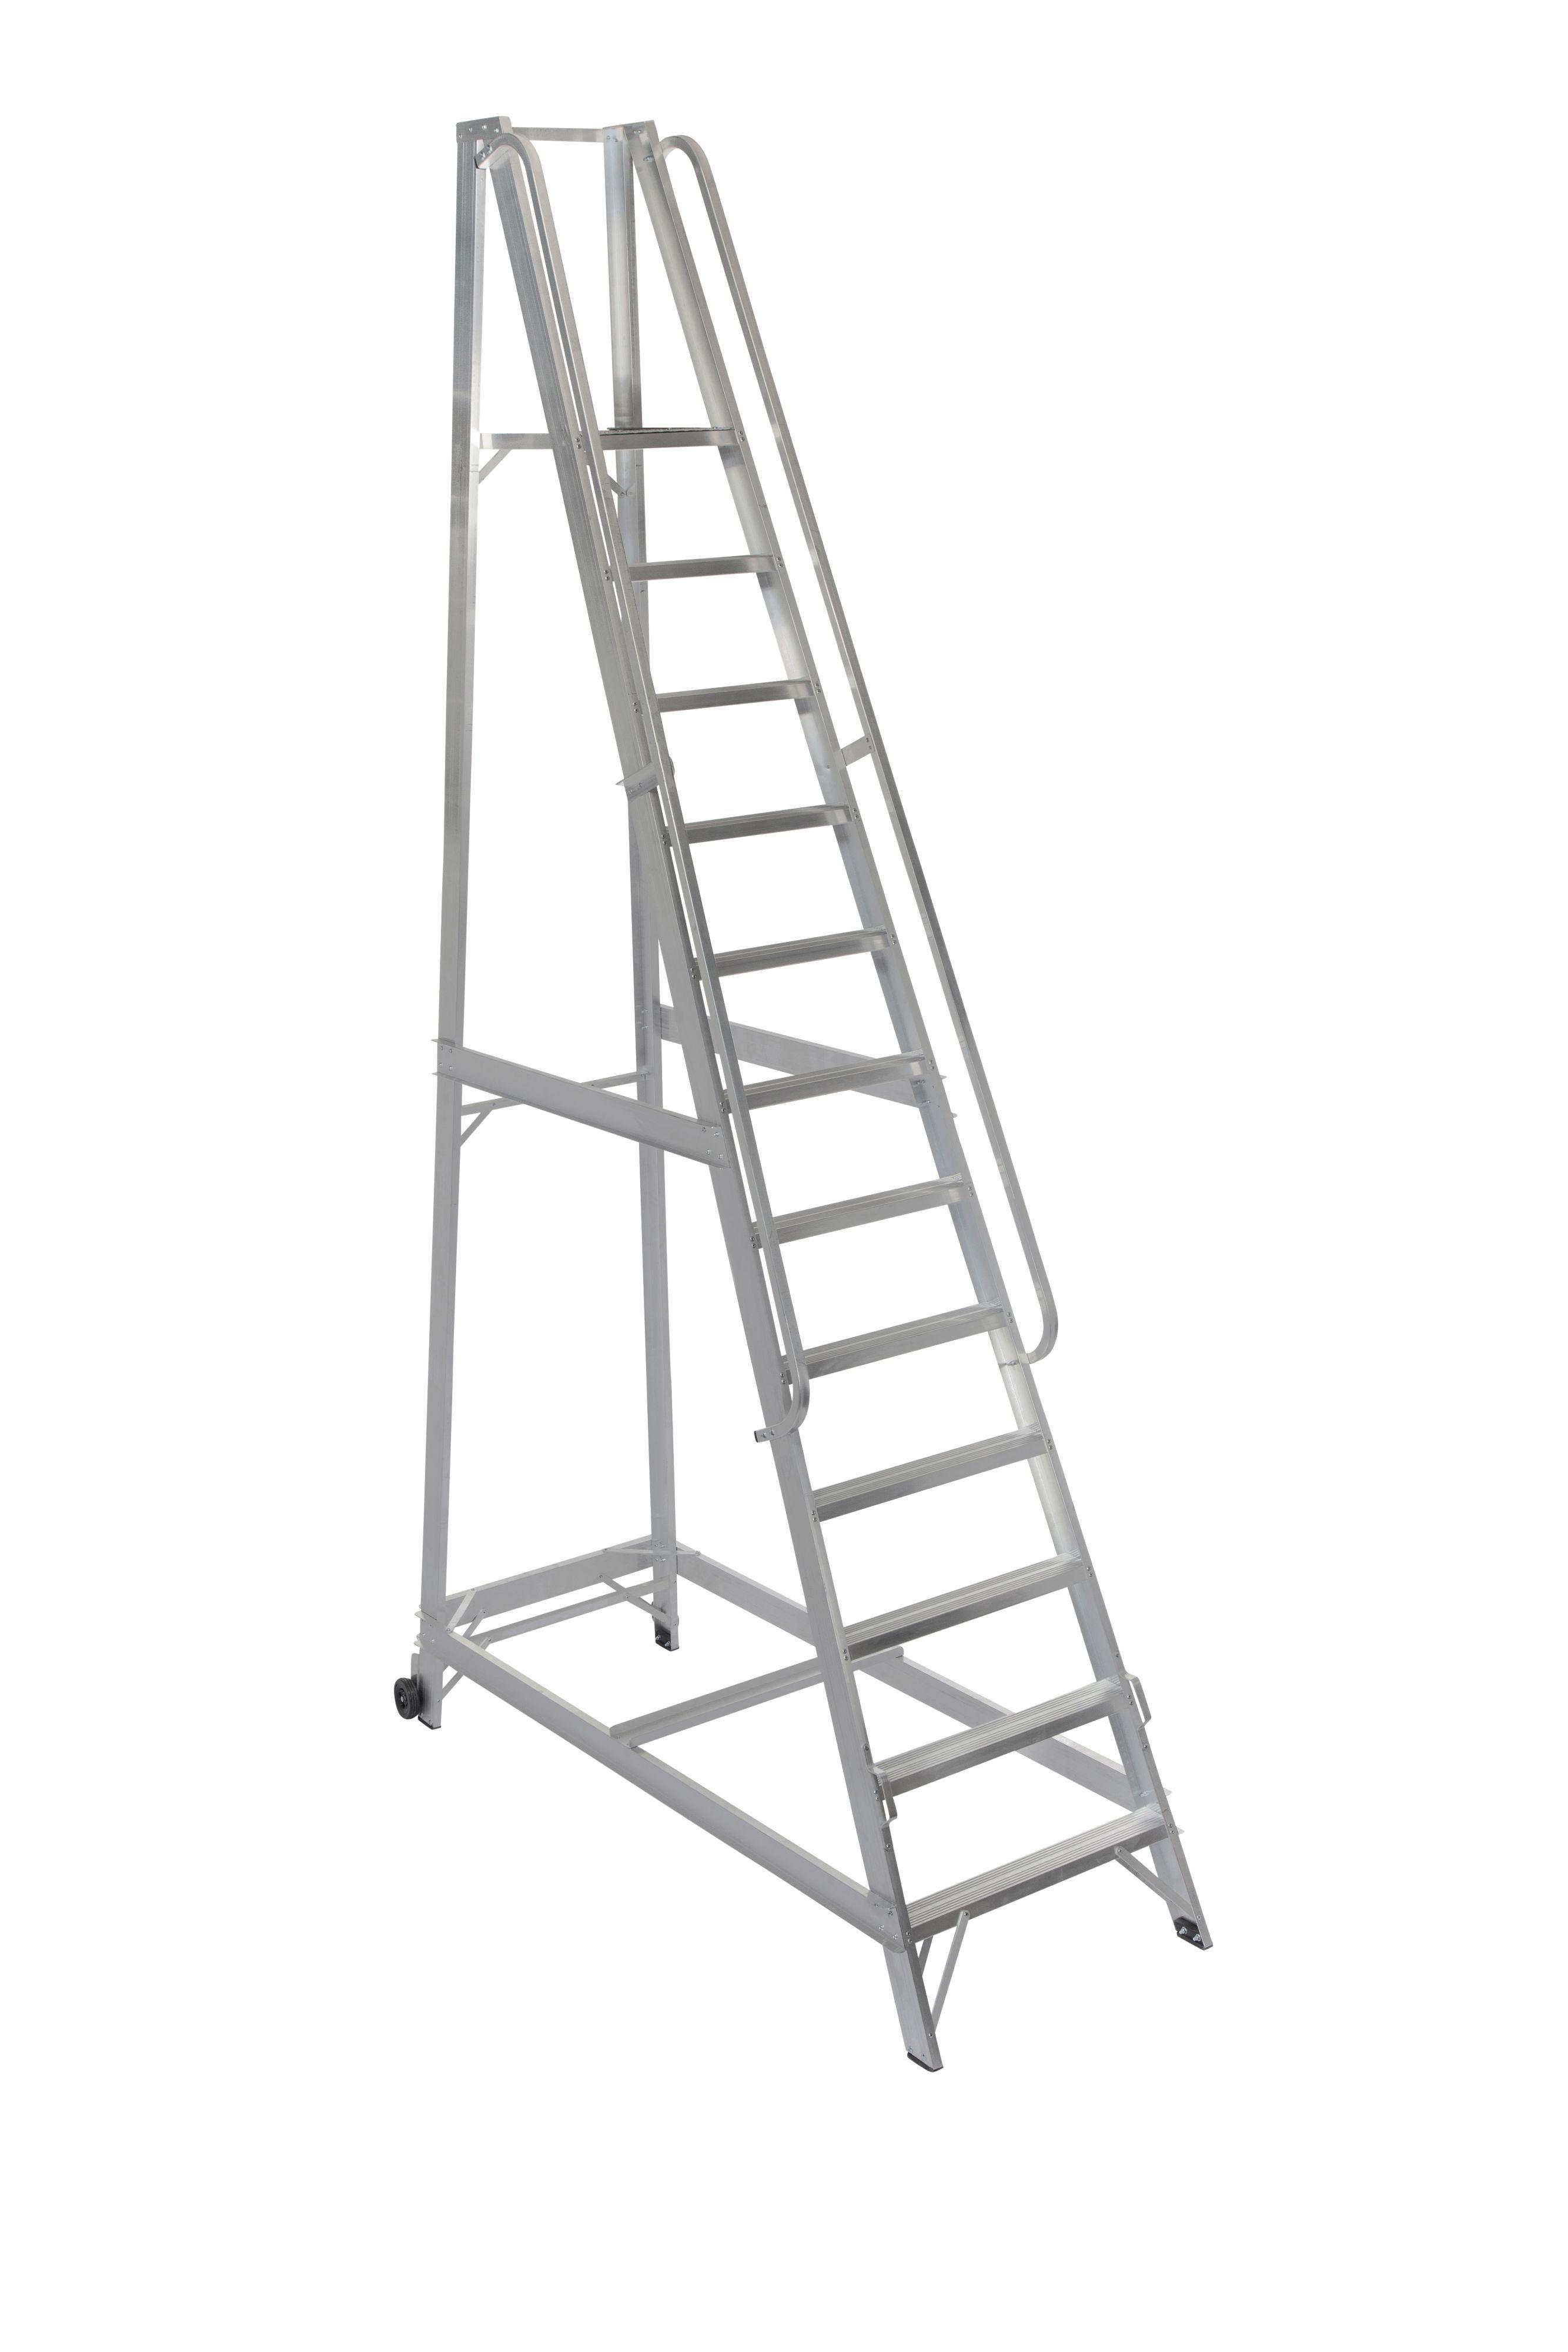 Werner 12 Tread Aluminium Platform Stepladder, 3.5 M